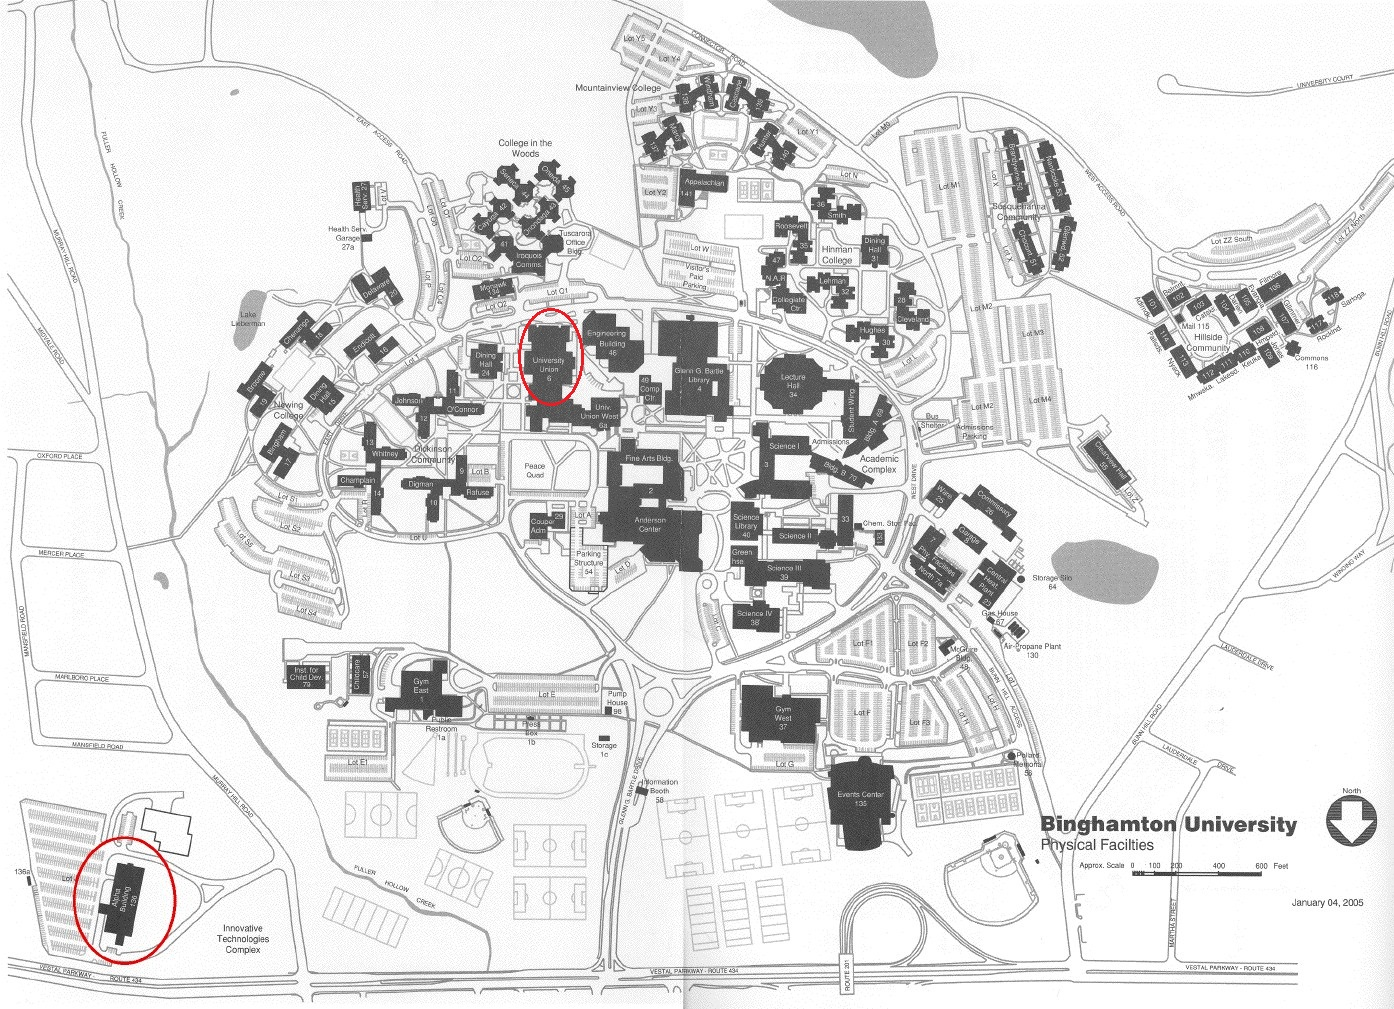 index of wpcontentthemessasebingcustomimages binghamton university . binghamton university map binghamton university binghamton